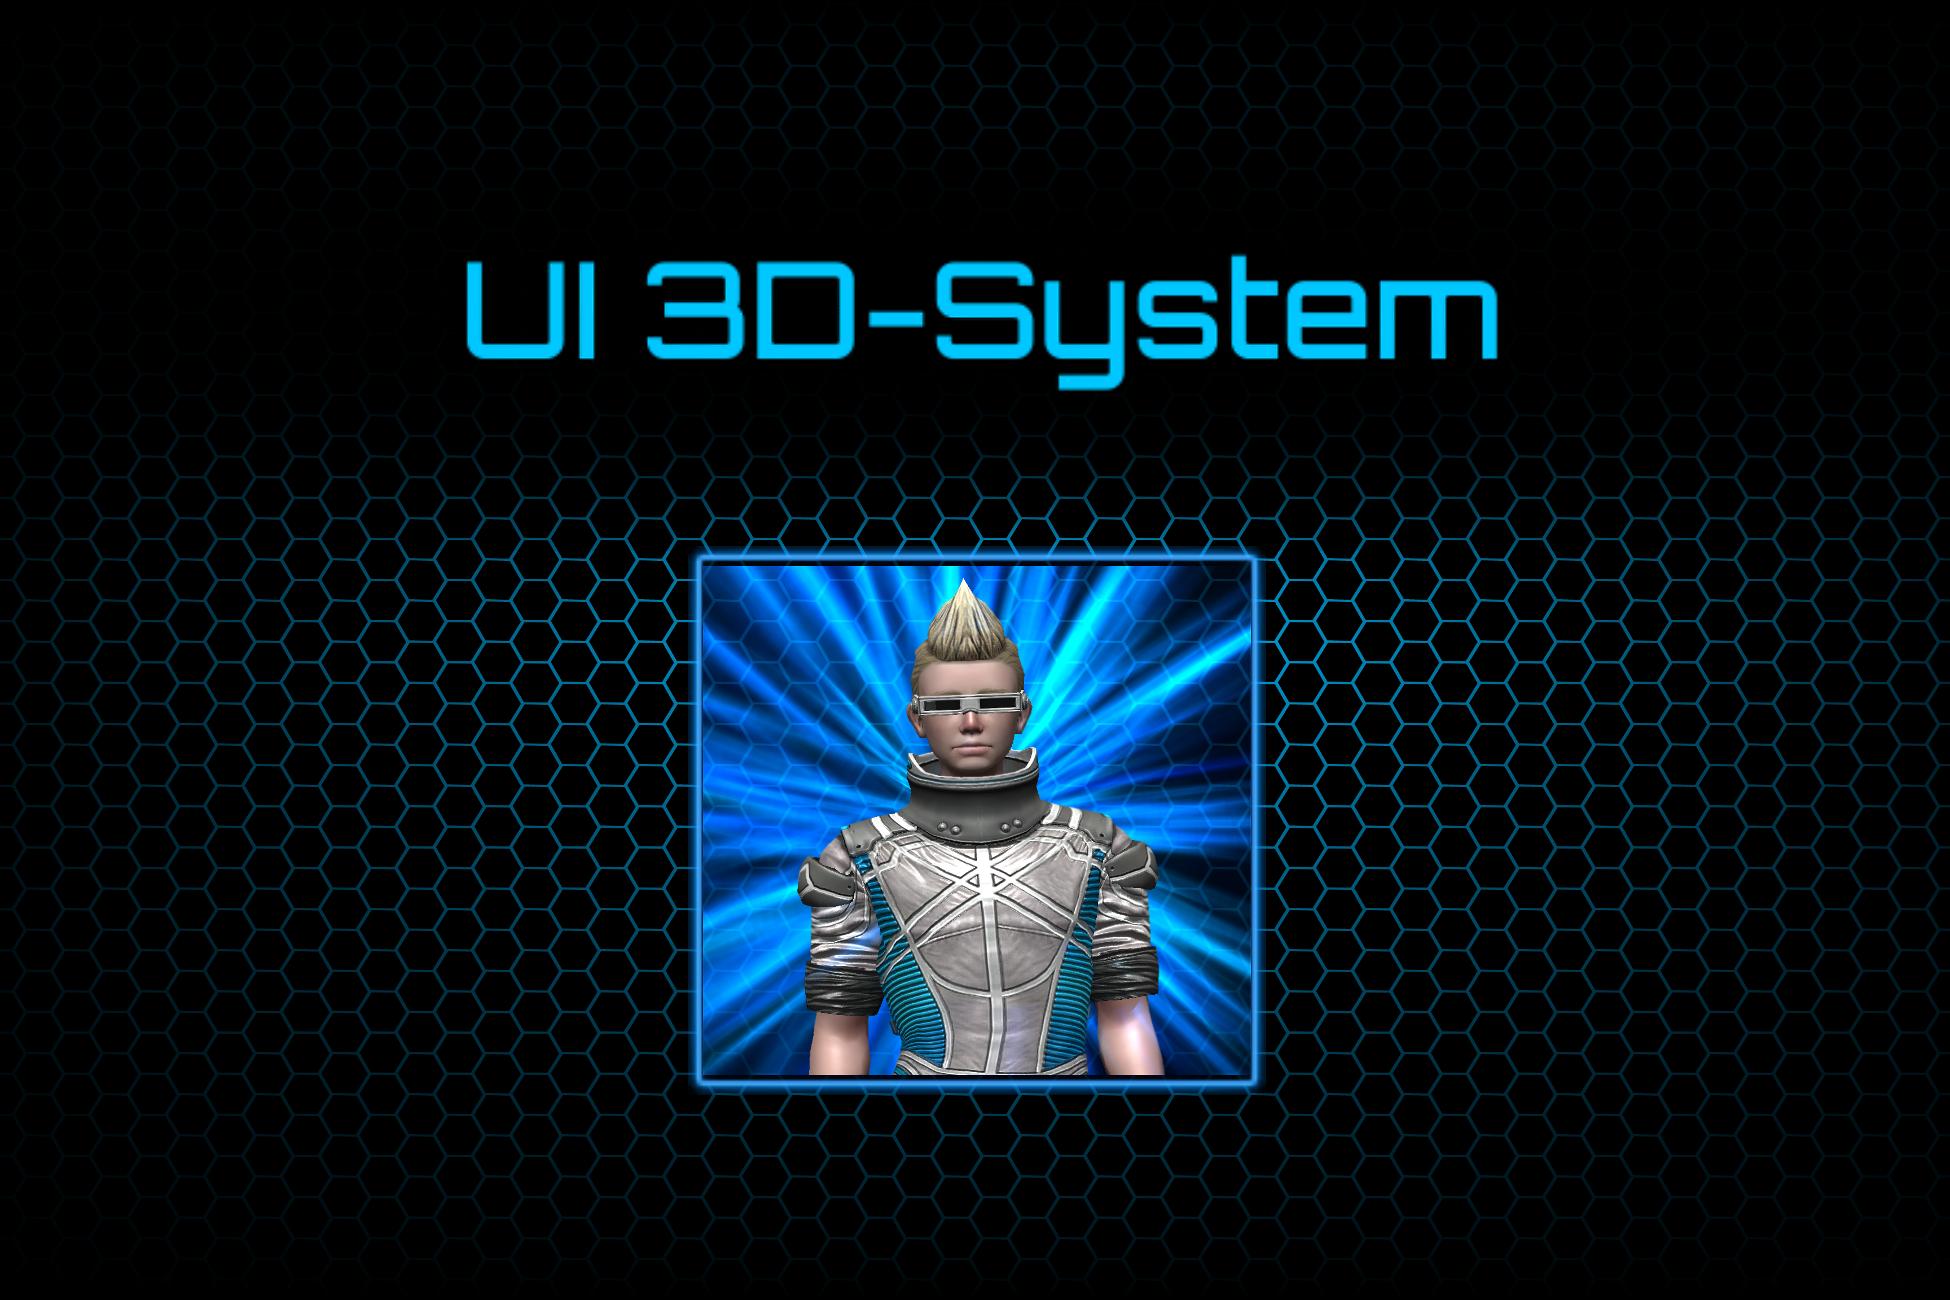 UI 3D System